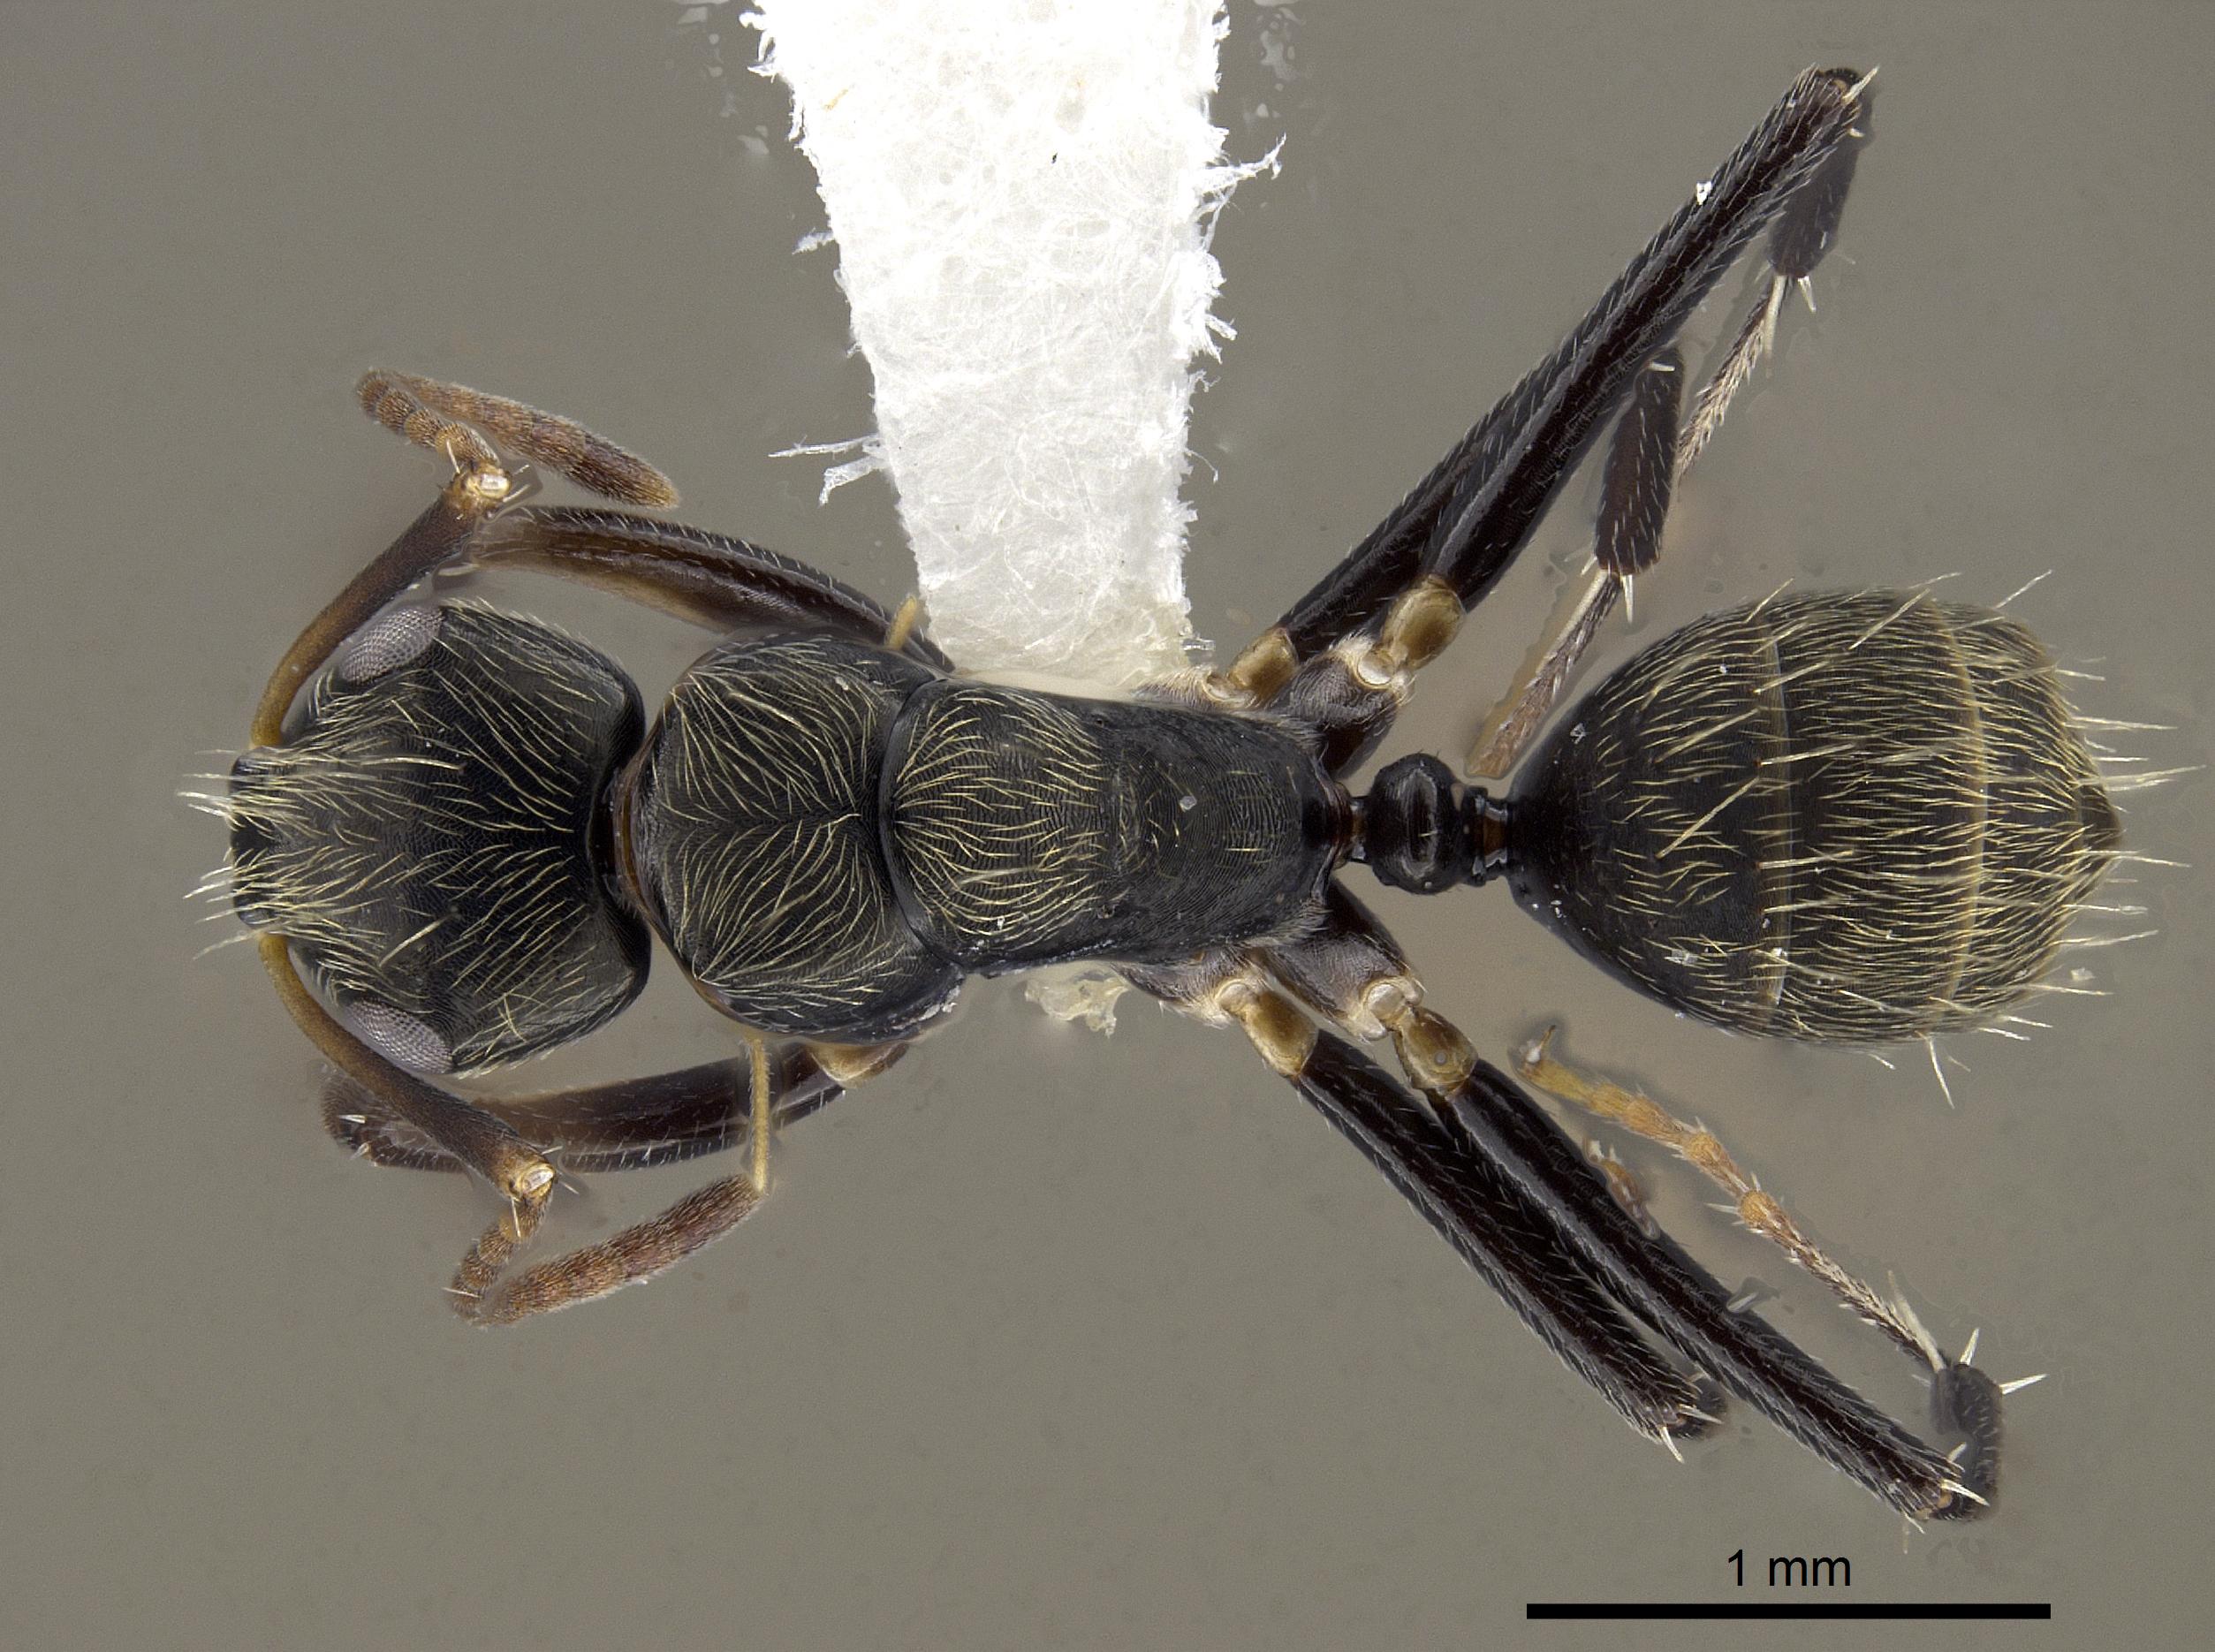 Image of Camponotus froggatti